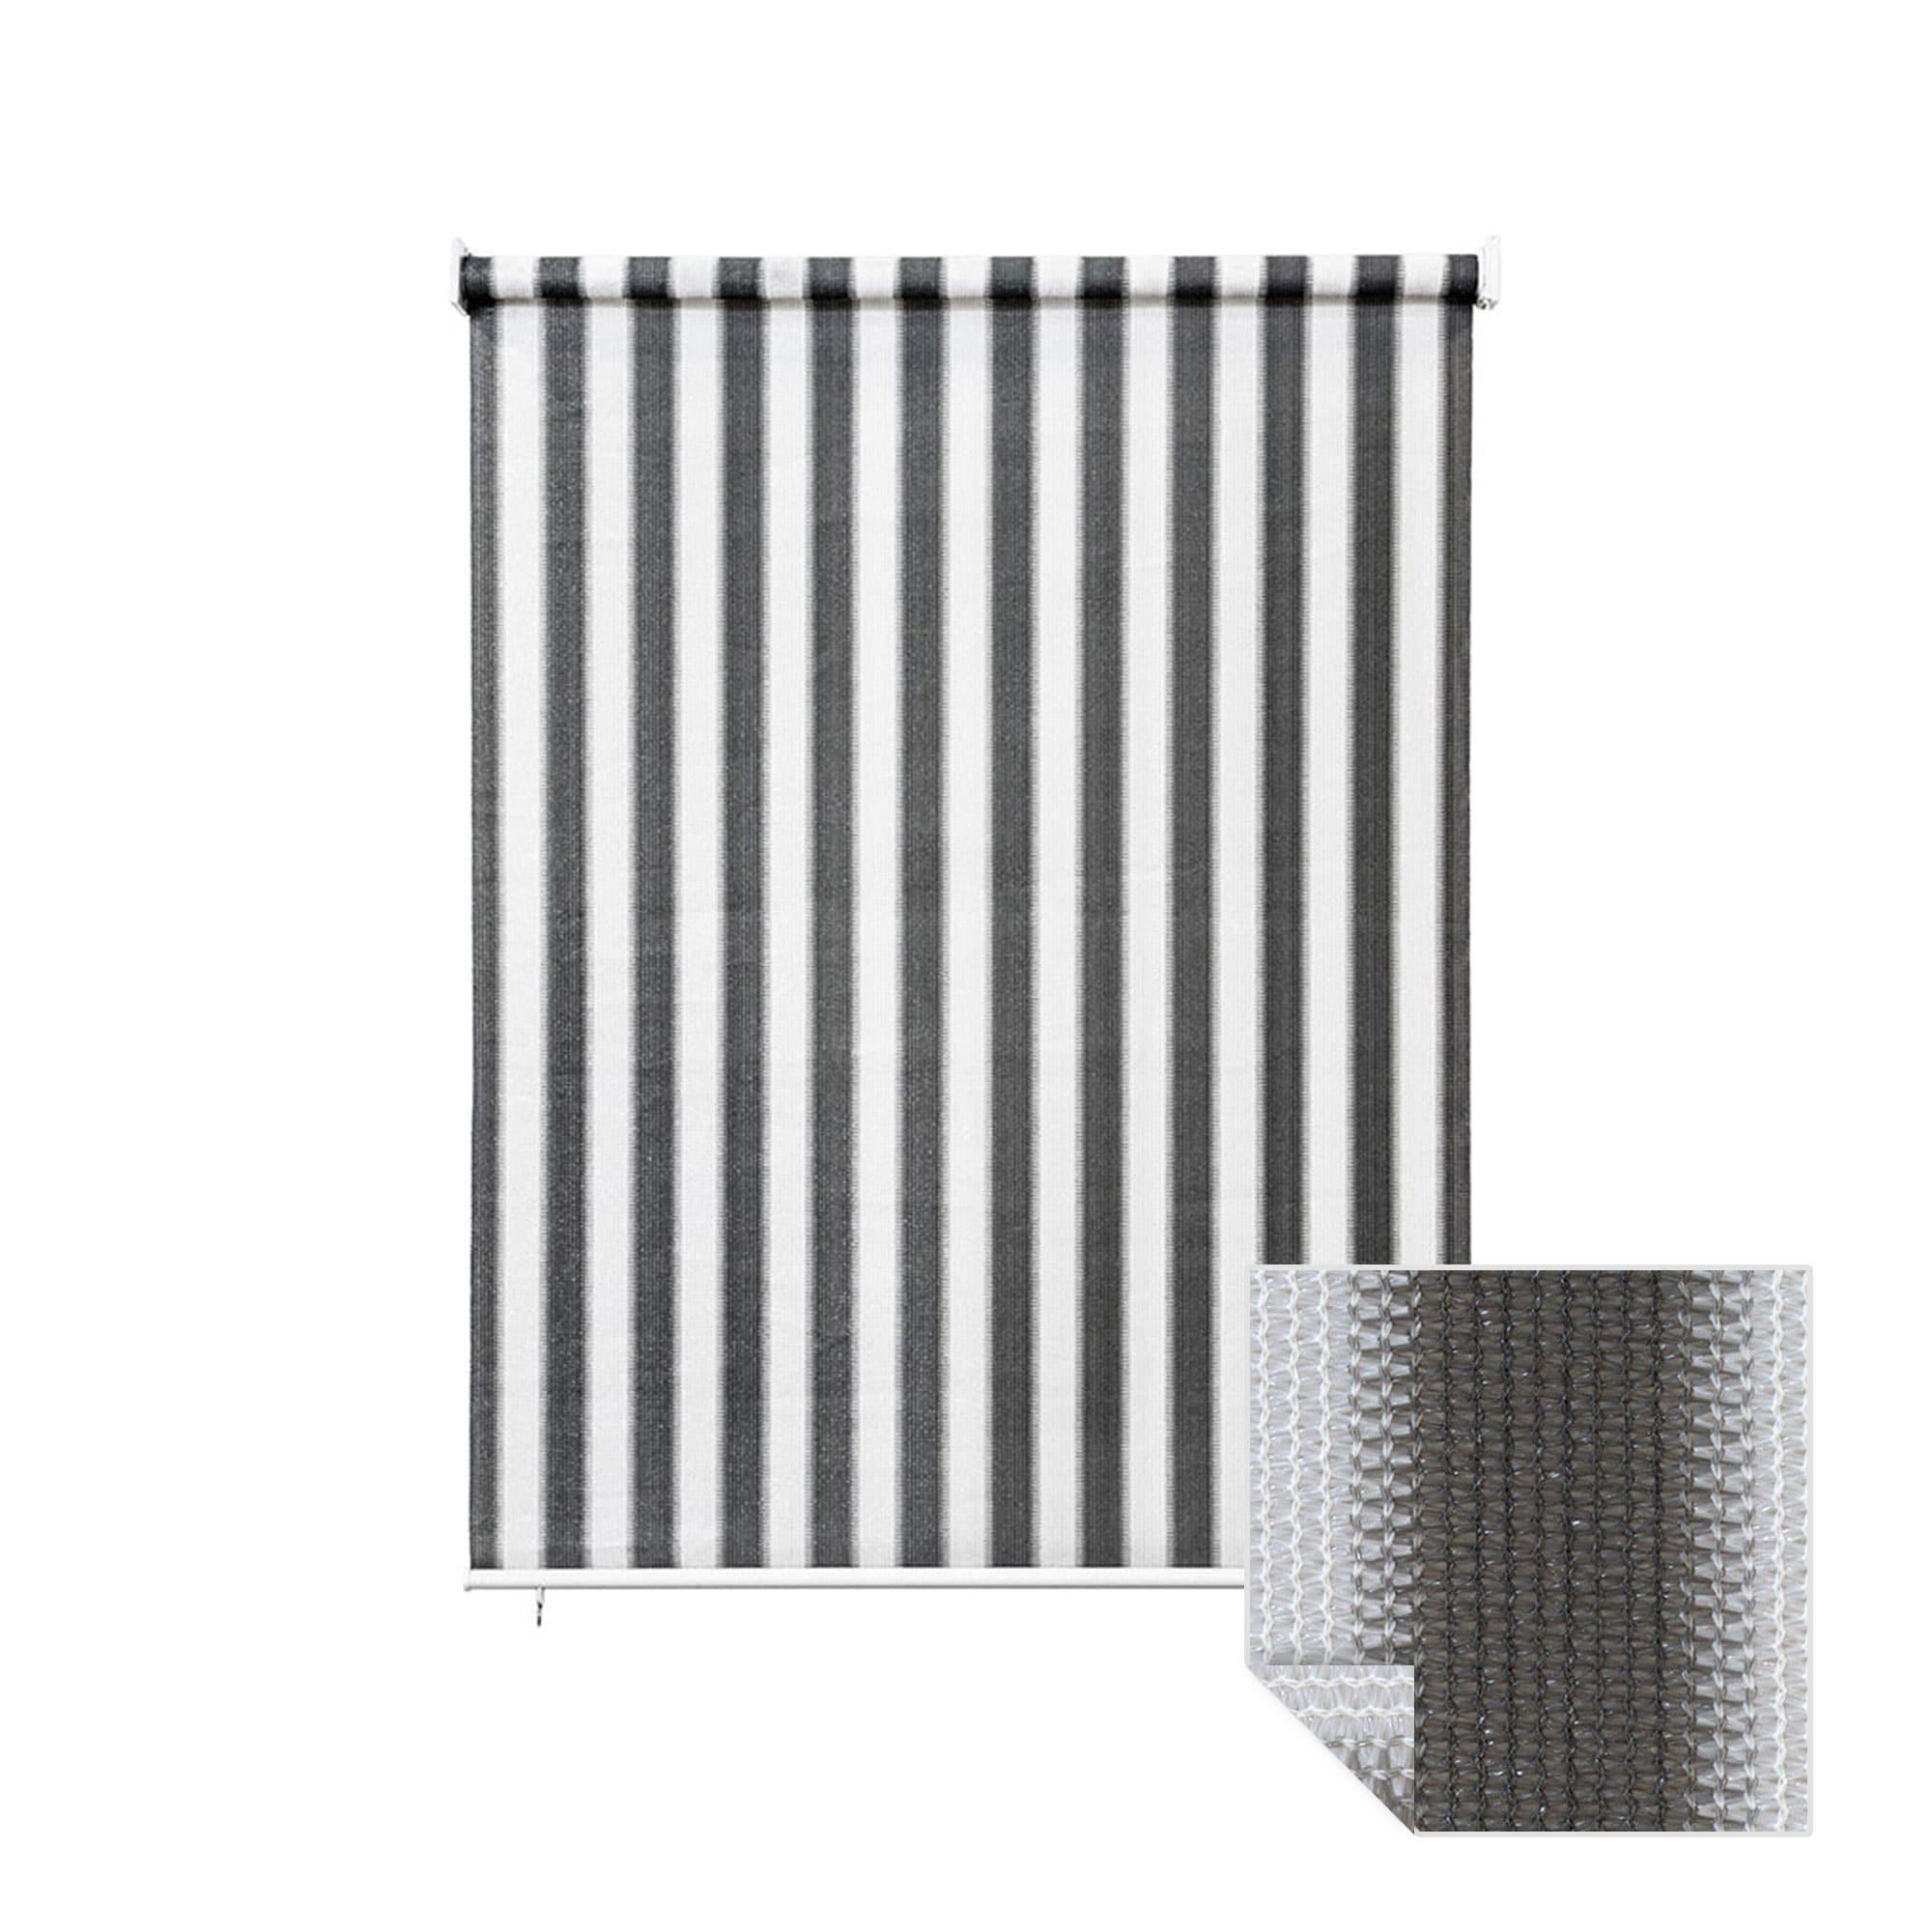 au enrollo balkon senkrechtmarkise 180 x 240cm grau wei jarolift. Black Bedroom Furniture Sets. Home Design Ideas